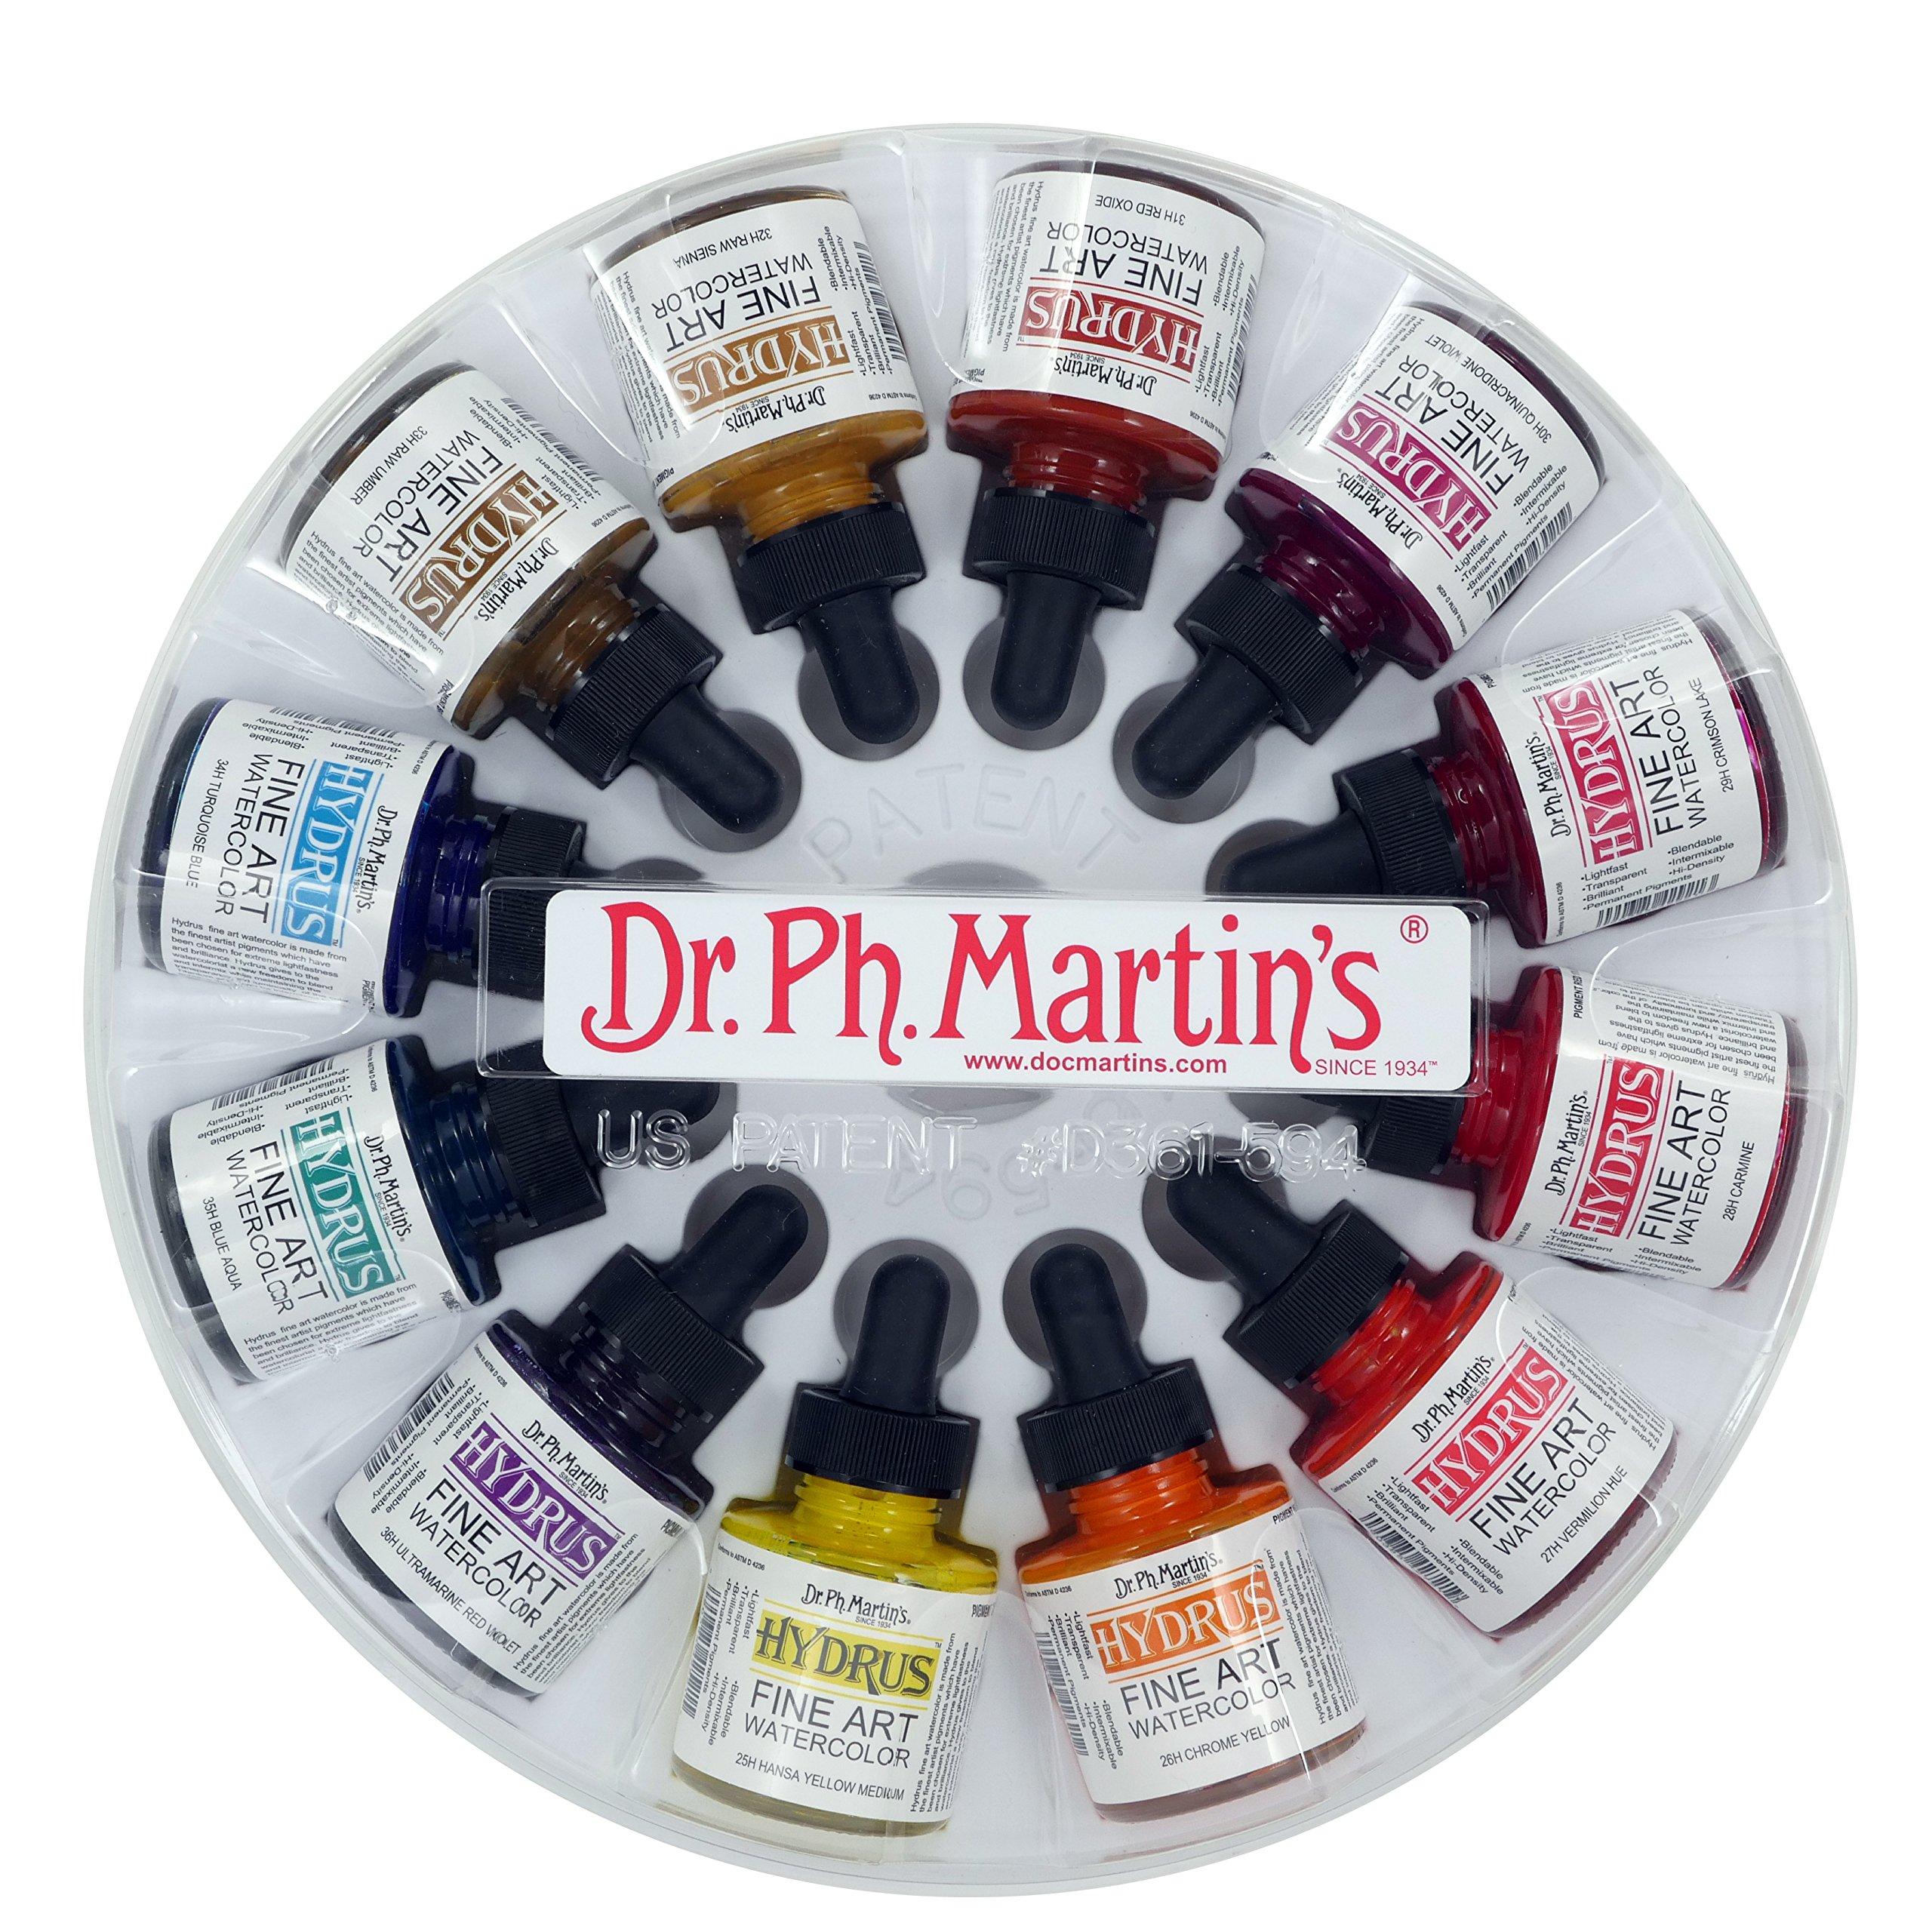 Dr. Ph. Martin's Hydrus Fine Art Watercolor Bottles, 1.0 oz, Set of 12 (Set 3)